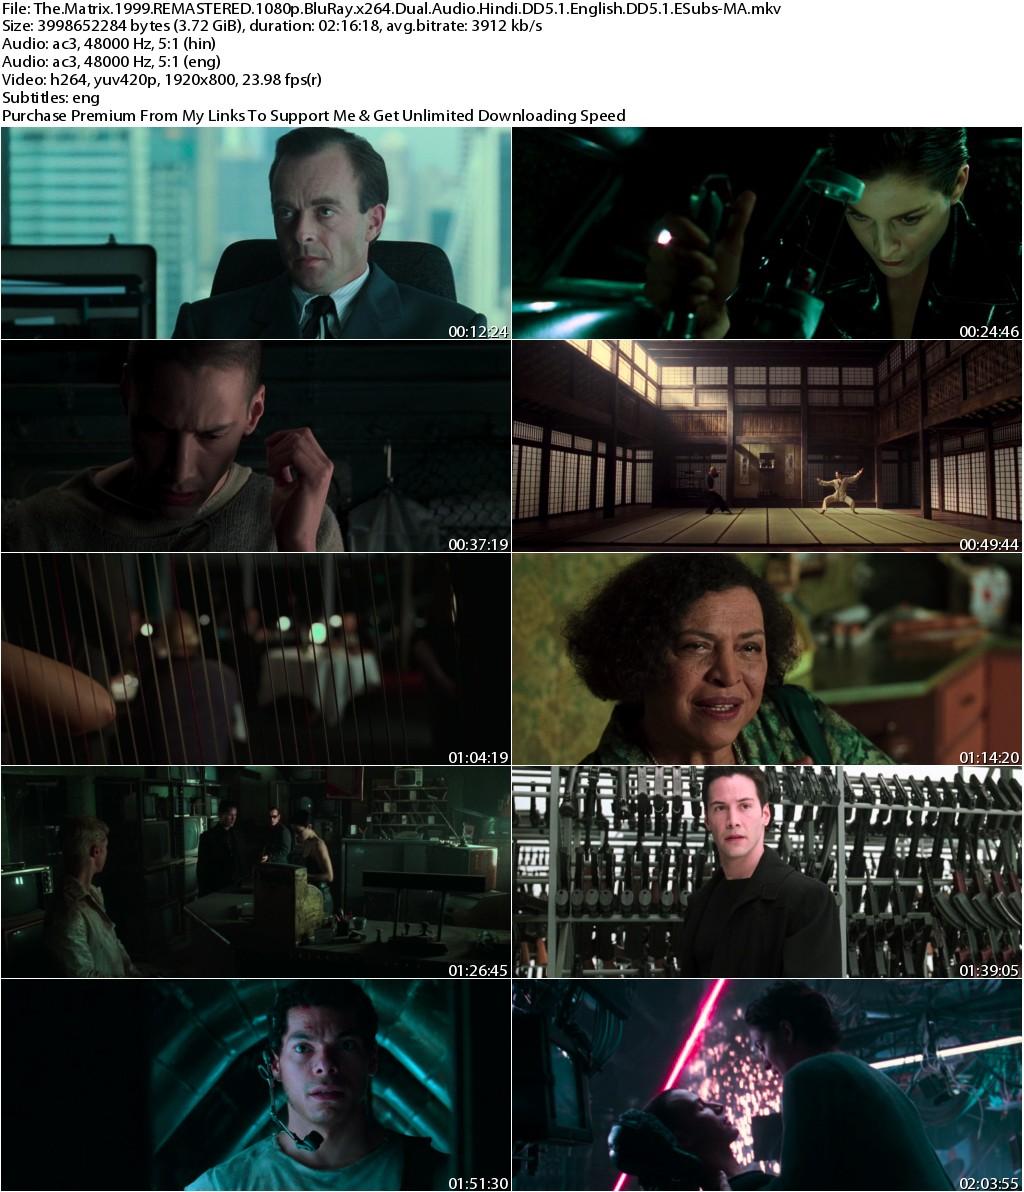 The Matrix (1999) REMASTERED 1080p BluRay x264 Dual Audio Hindi DD5.1 English DD5.1 ESubs-MA